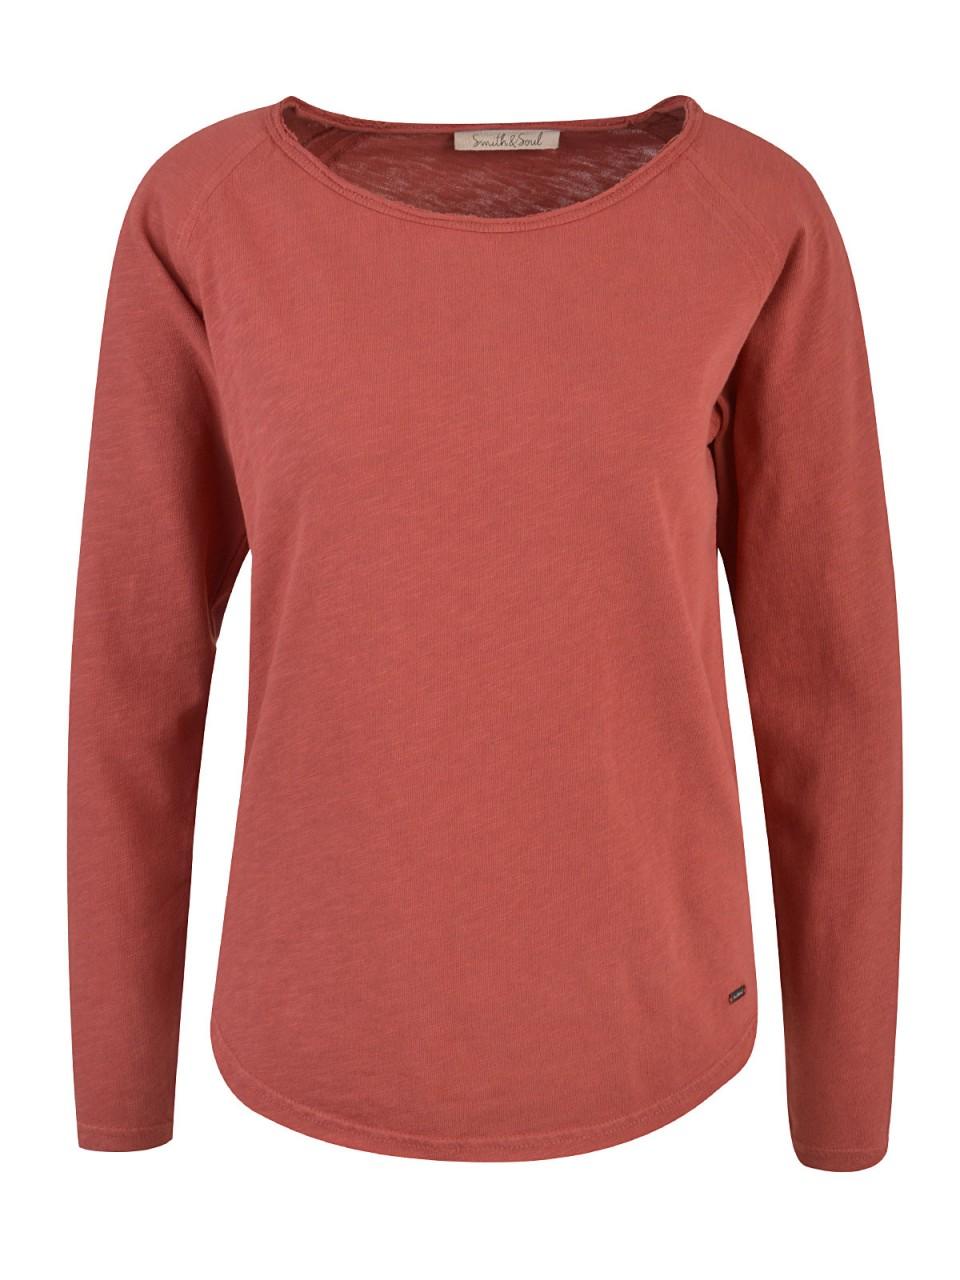 smith-amp-soul-damen-shirt-rost